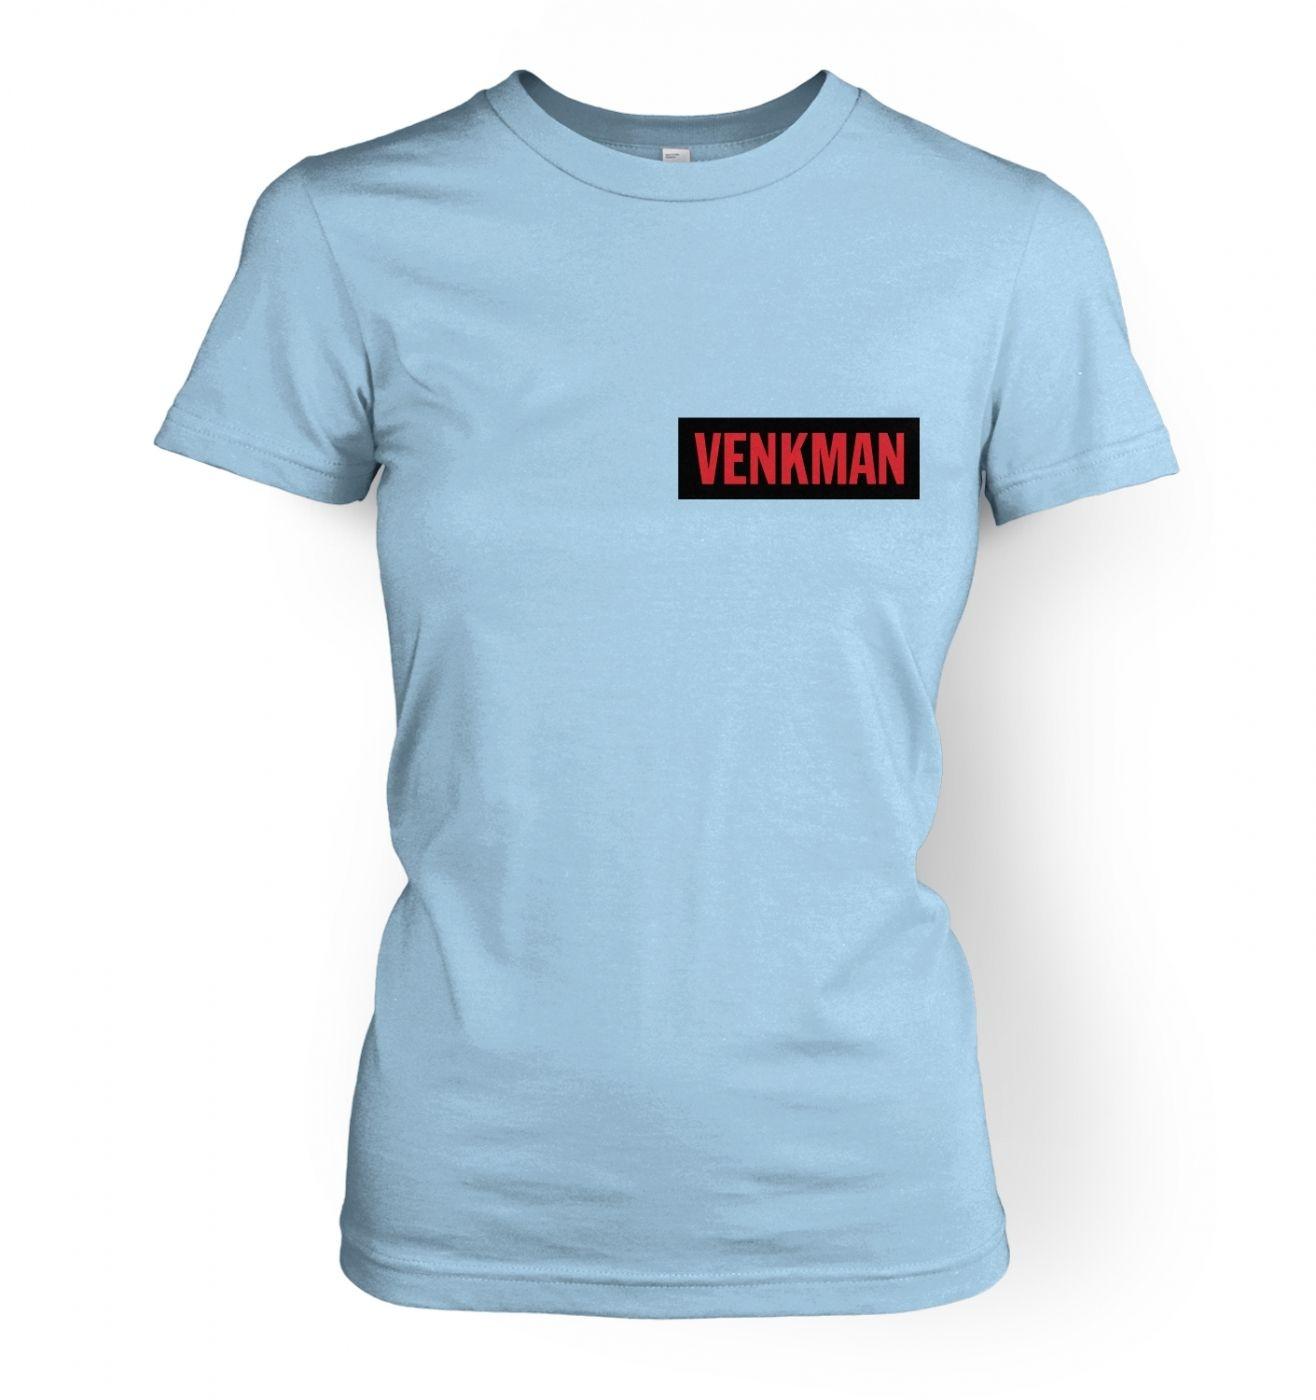 Venkman Name Tag women's t-shirt